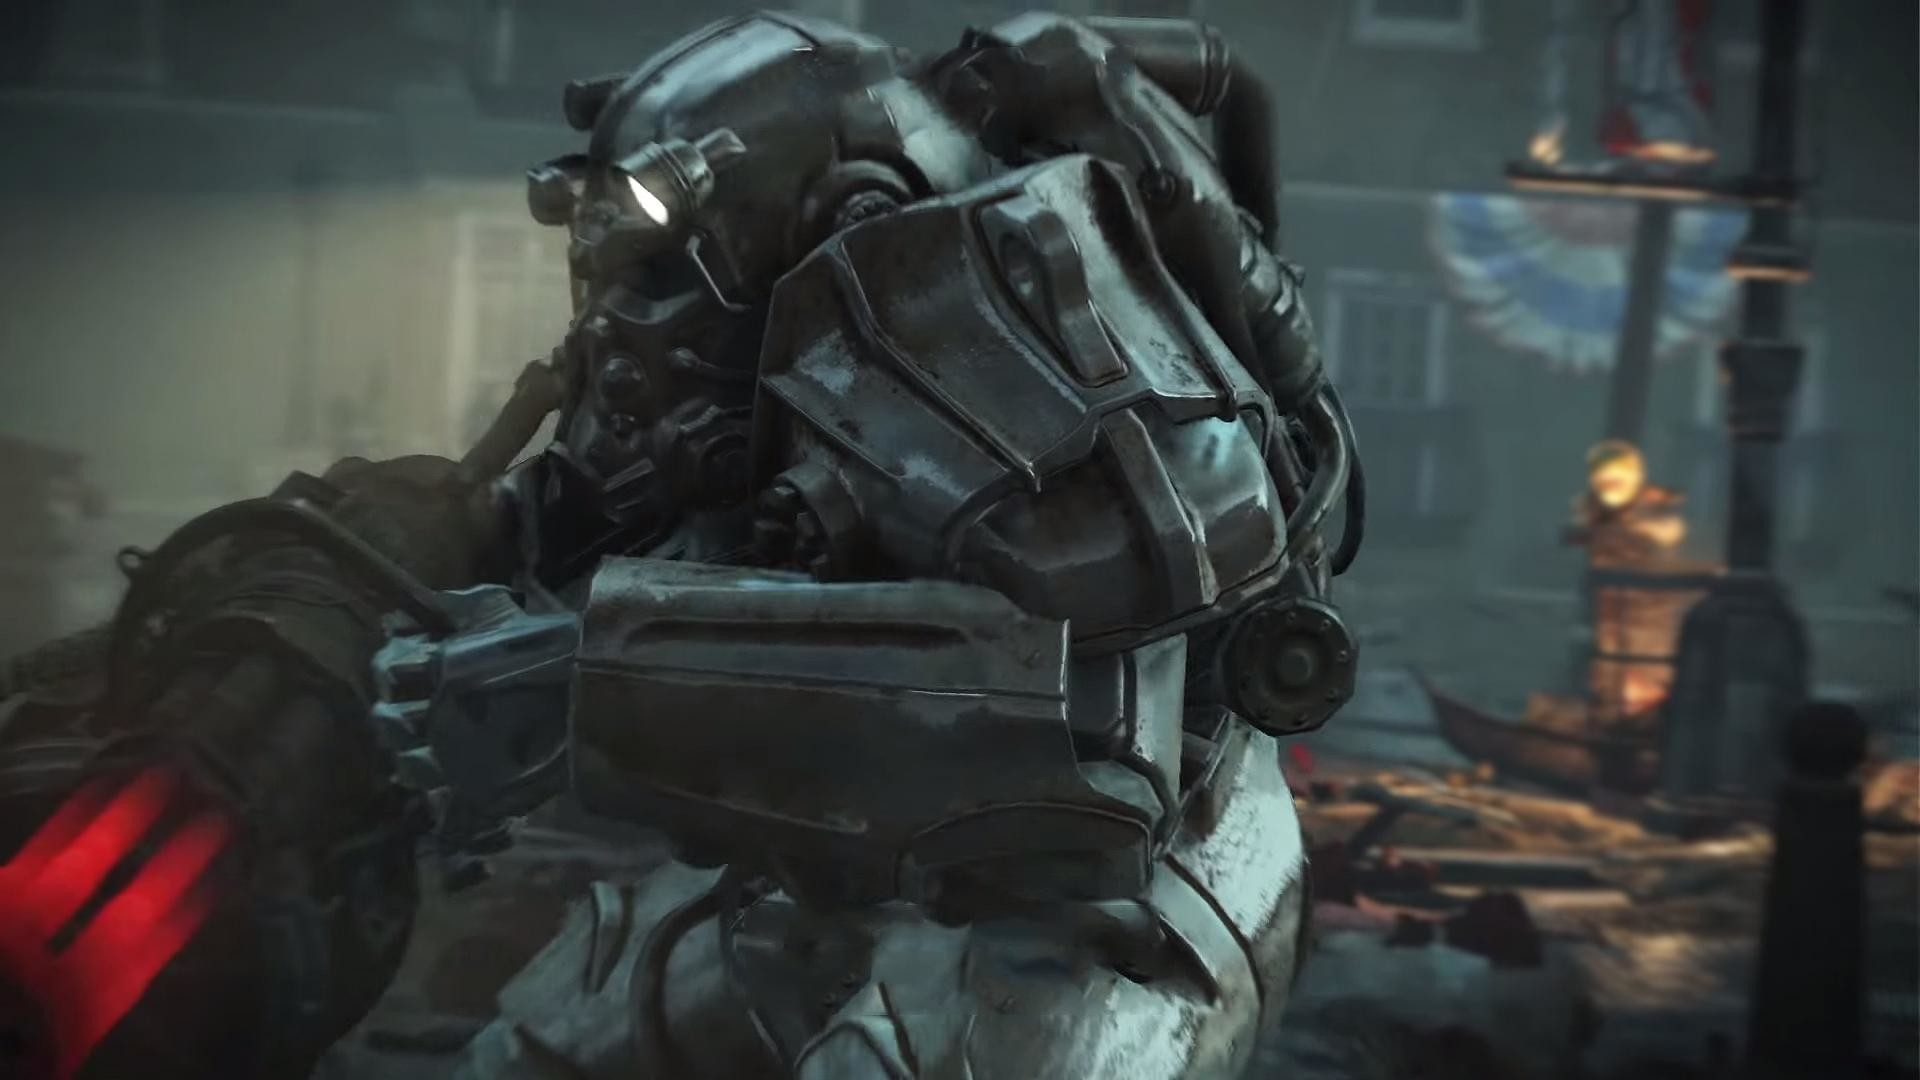 Res: 1920x1080, fallout wallpaper armor